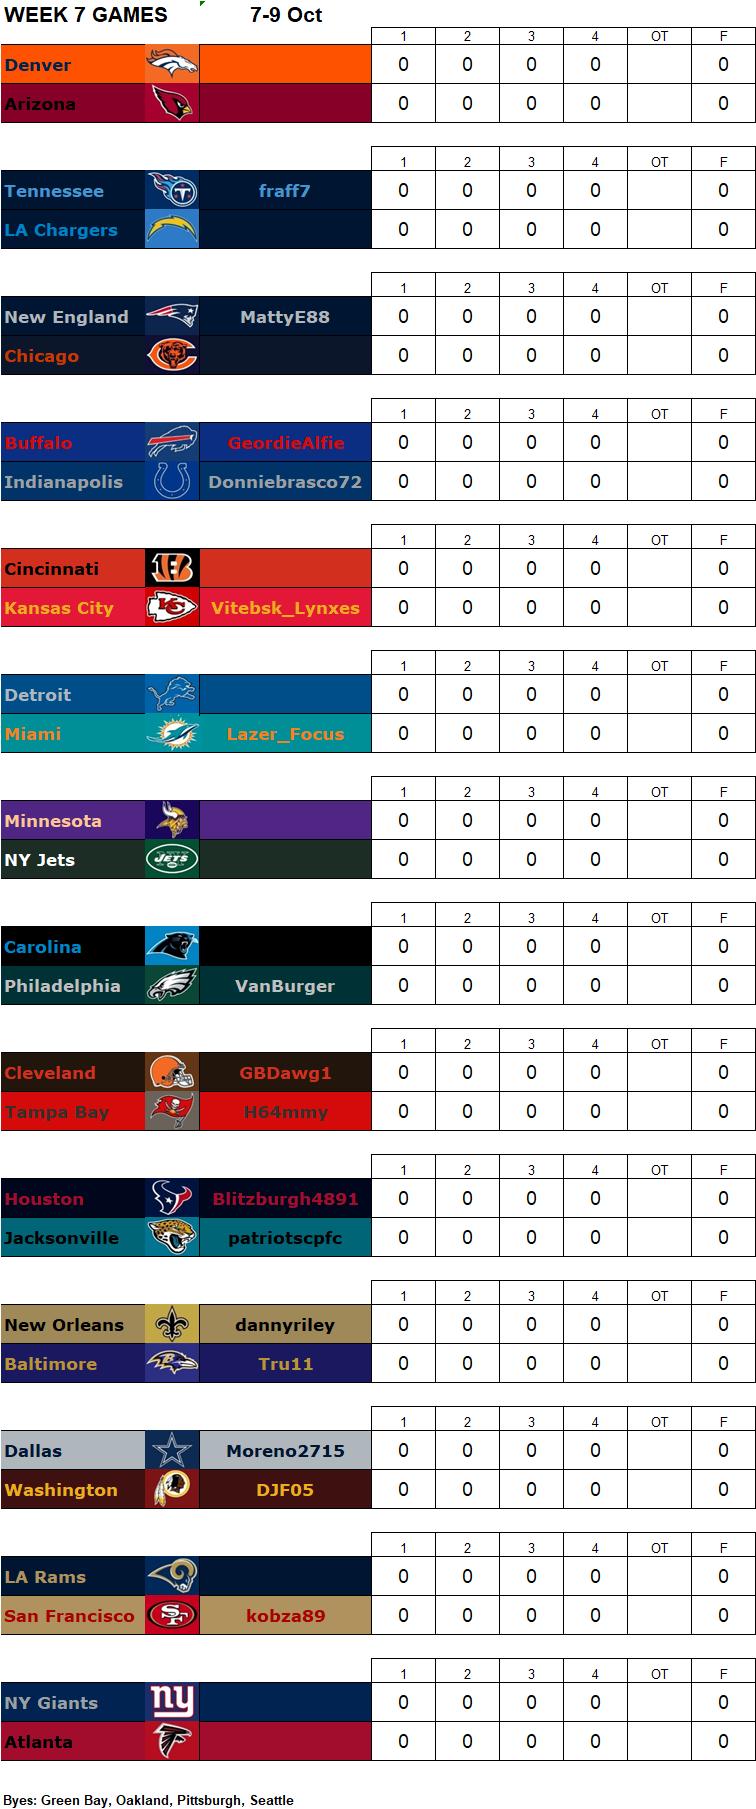 Week 7 Matchups, 7-9 October W7g10